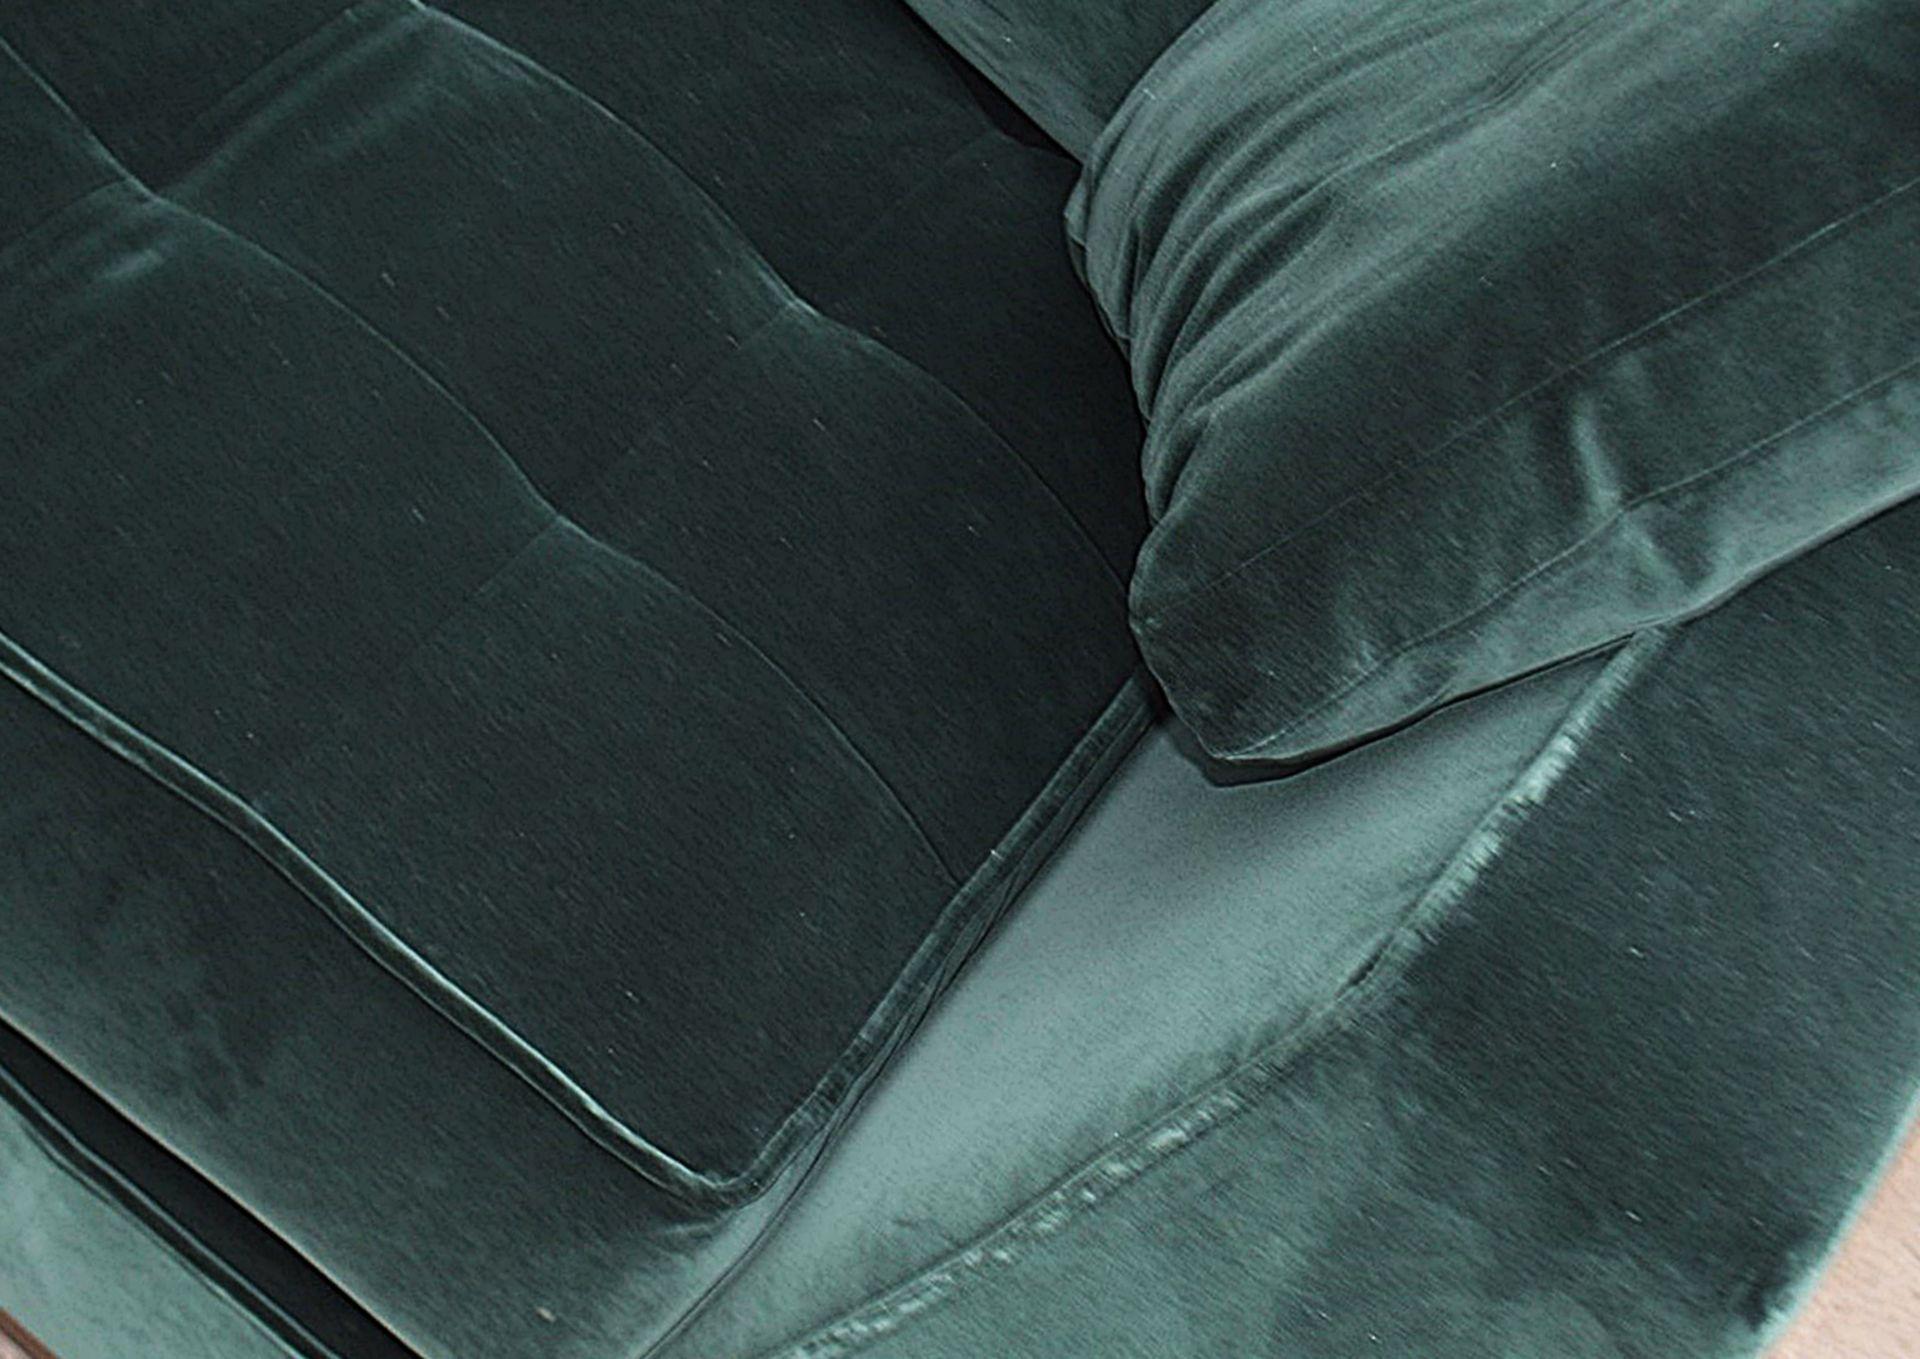 2 x B&B Italia MAXALTO Luxury Sofa Sections Both Upholstered In Rich Dark Green Velvet - RRP £7,248 - Image 10 of 13